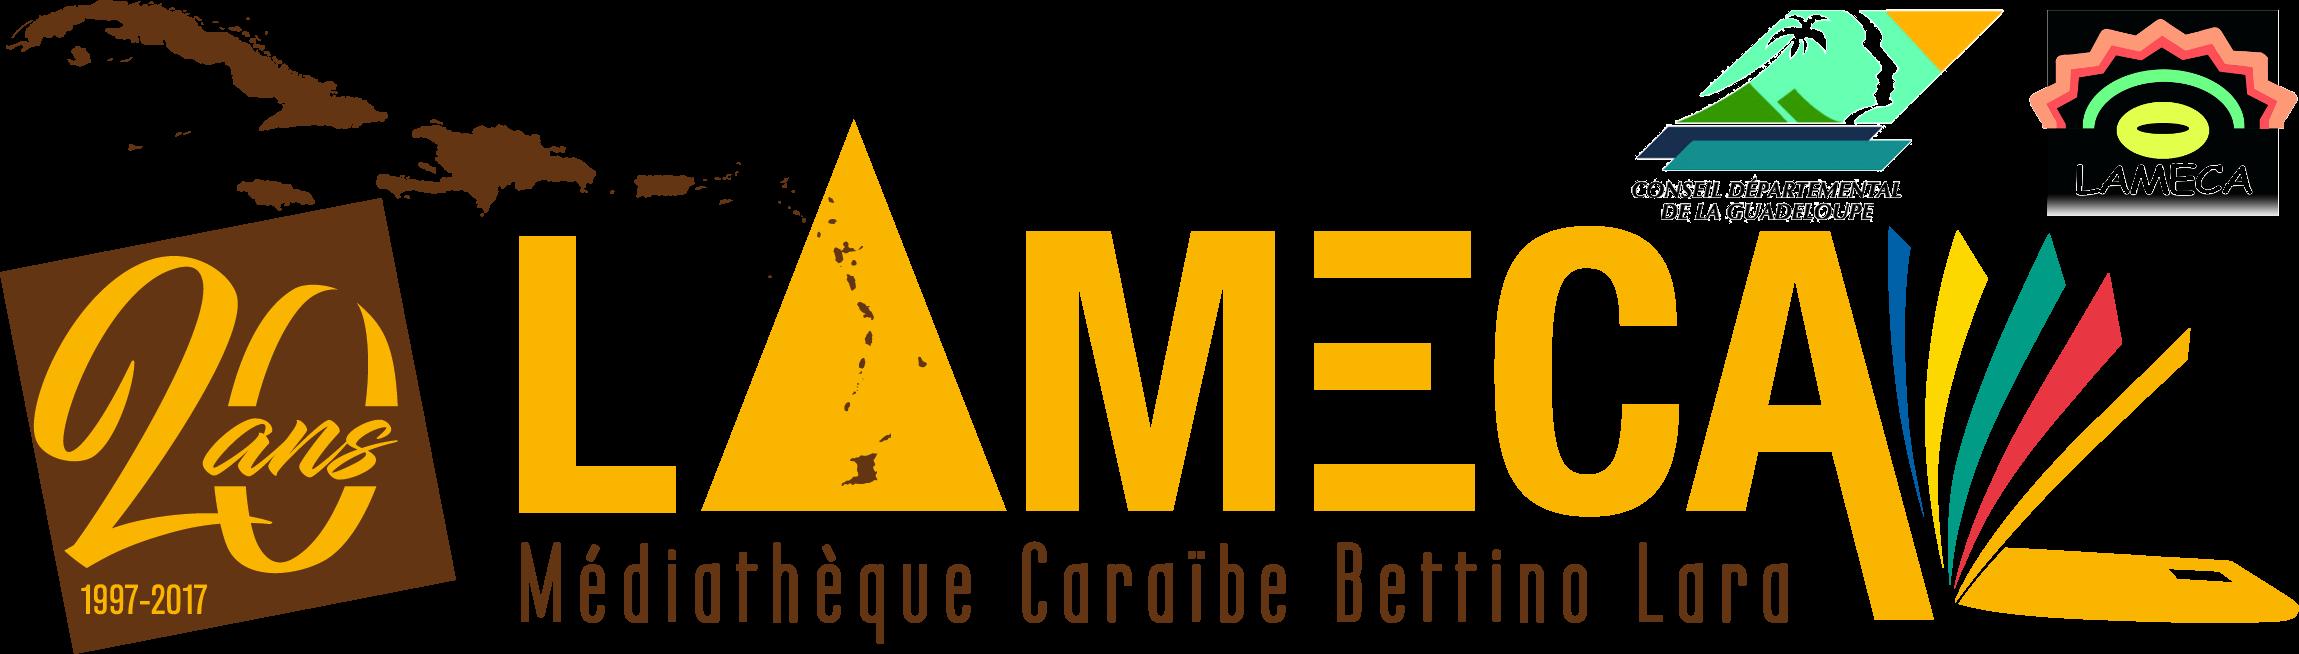 Médiathèque Caraïbe (Laméca)